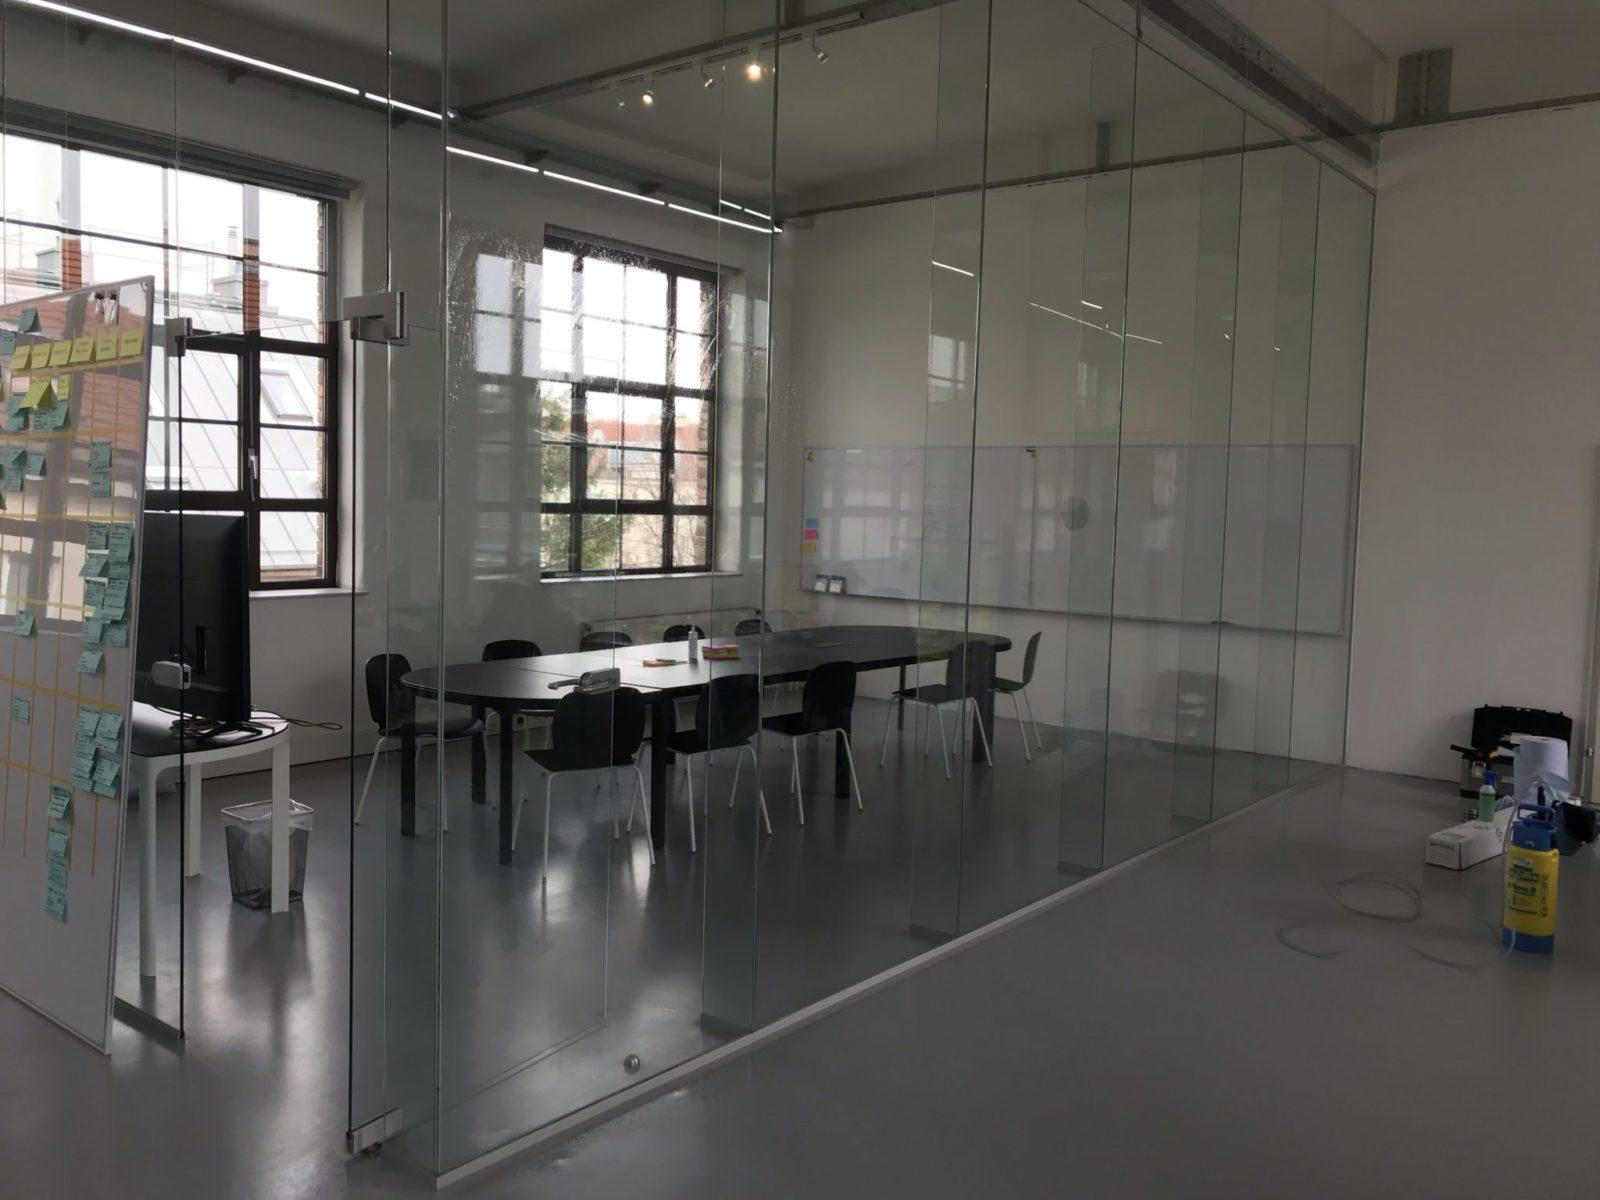 Besprechungsraum ohne Folie